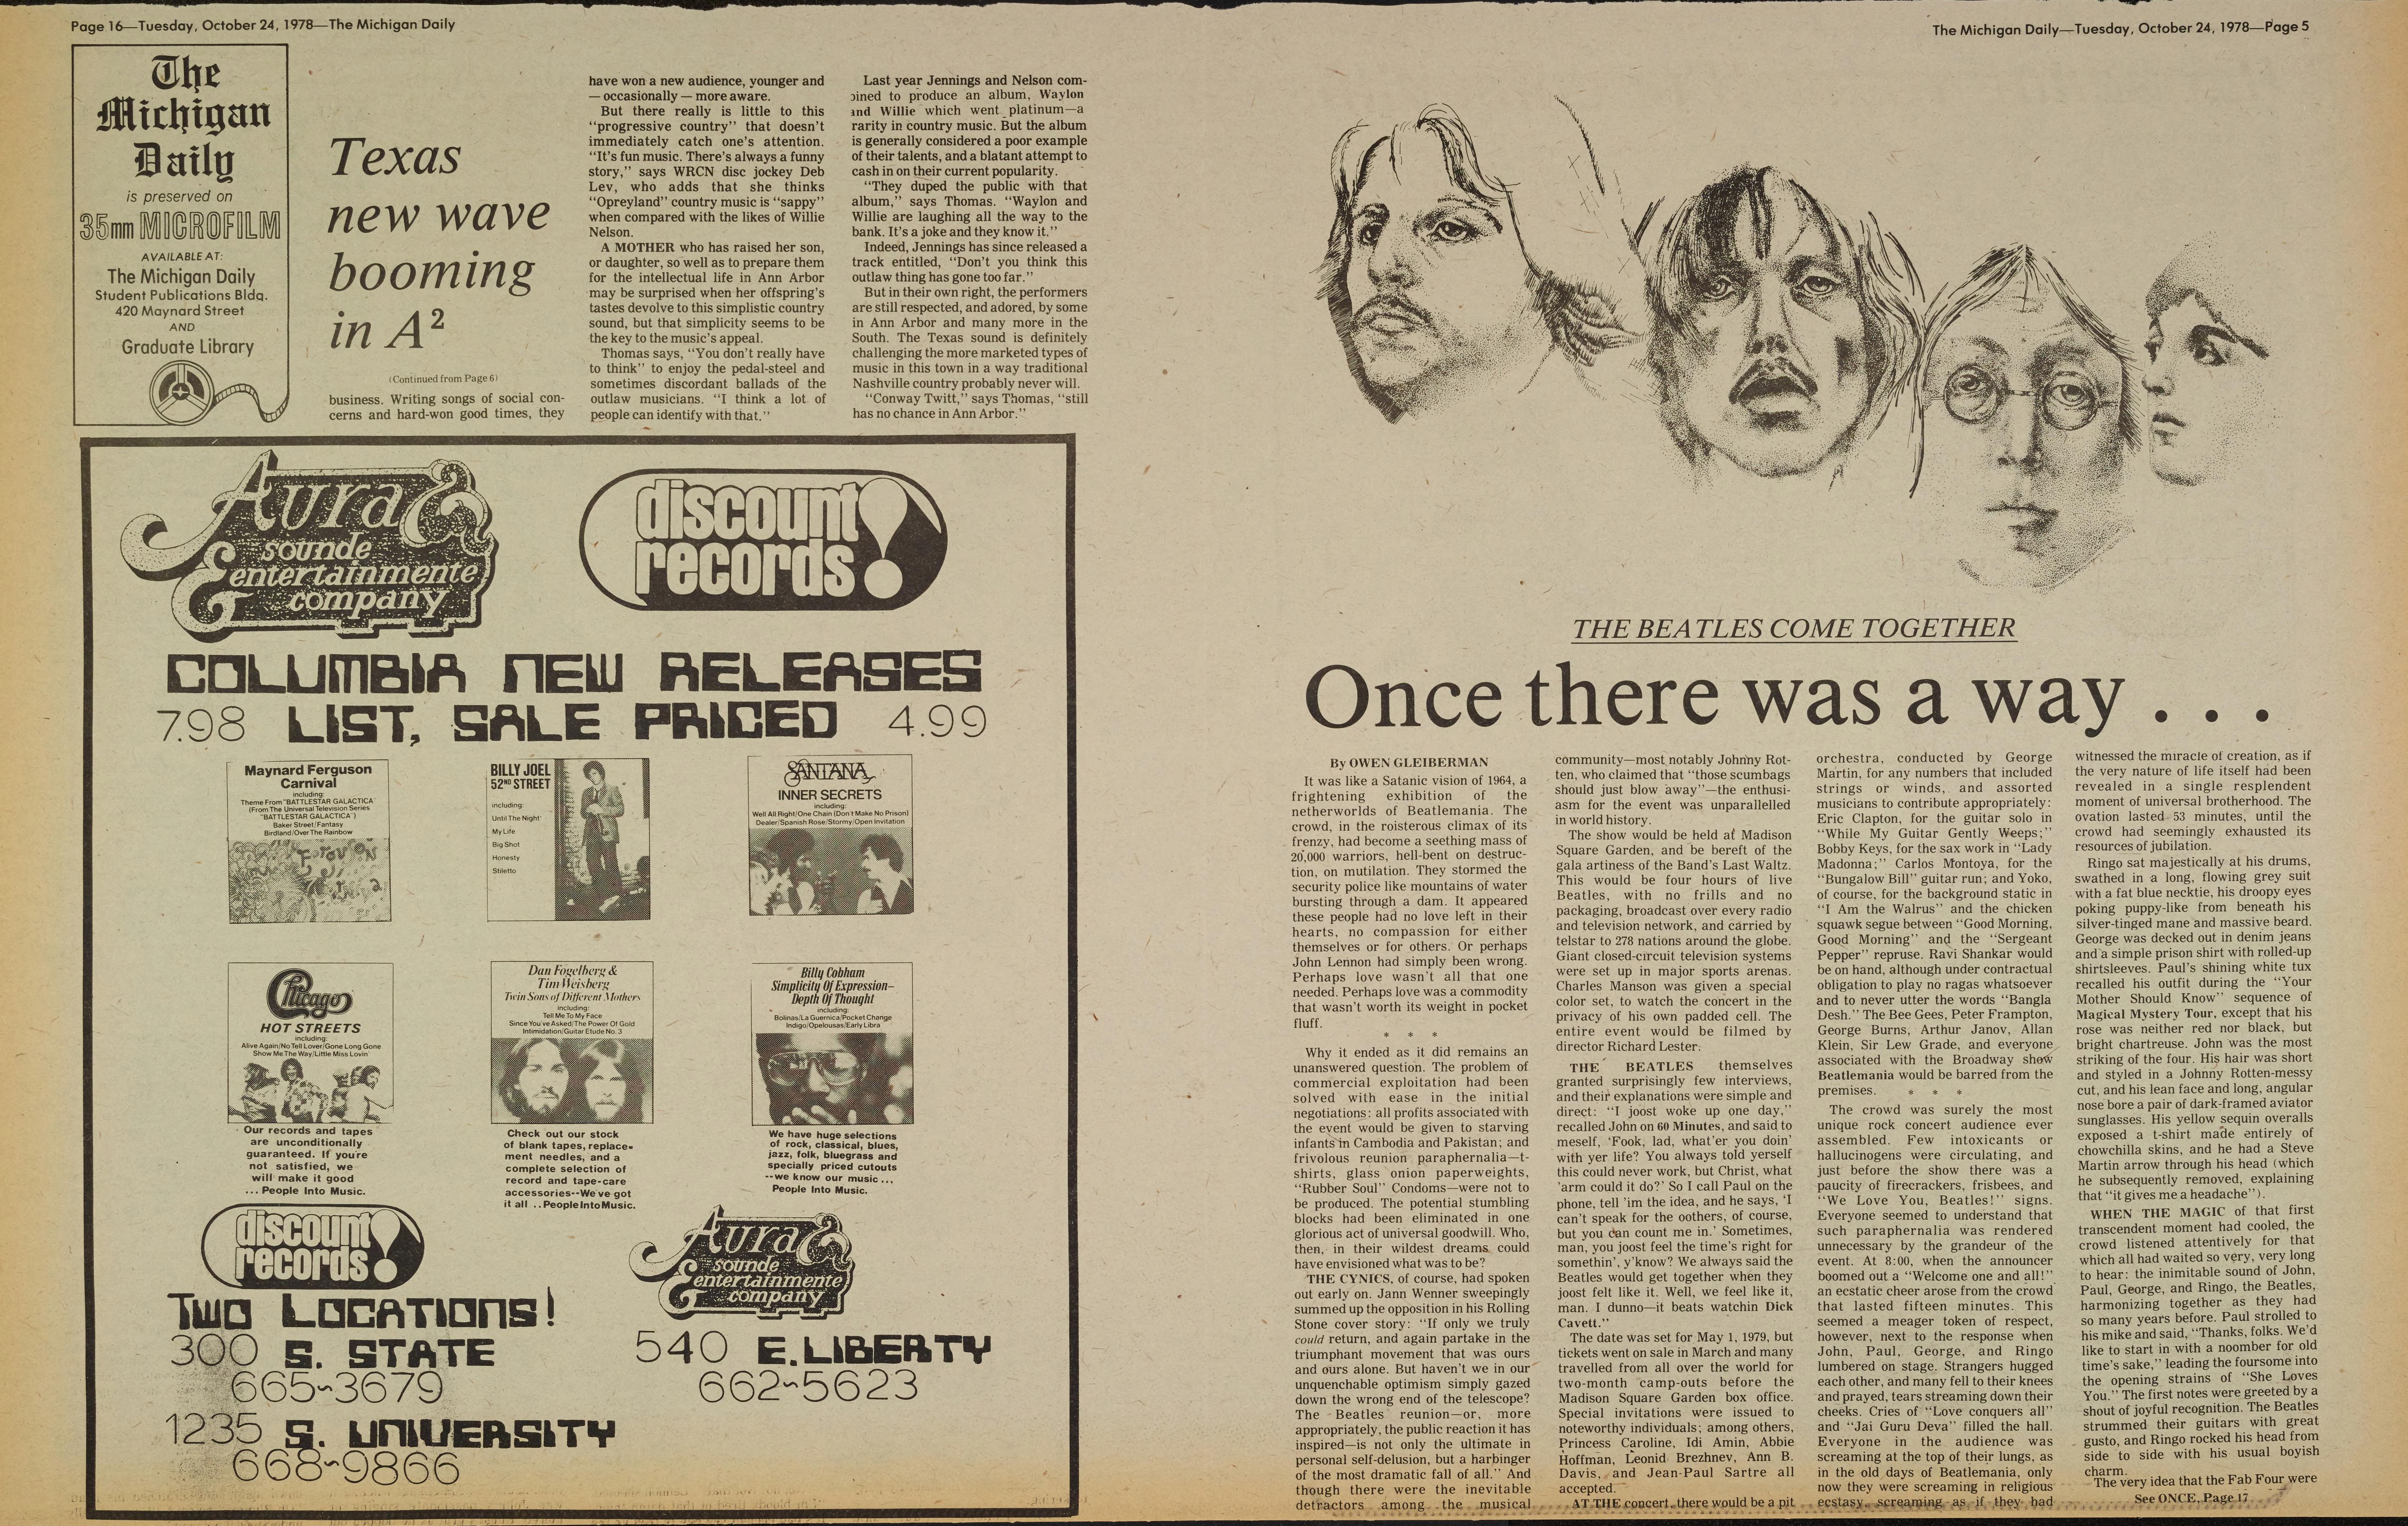 Michigan Daily Digital Archives - October 24, 1978 (vol  59